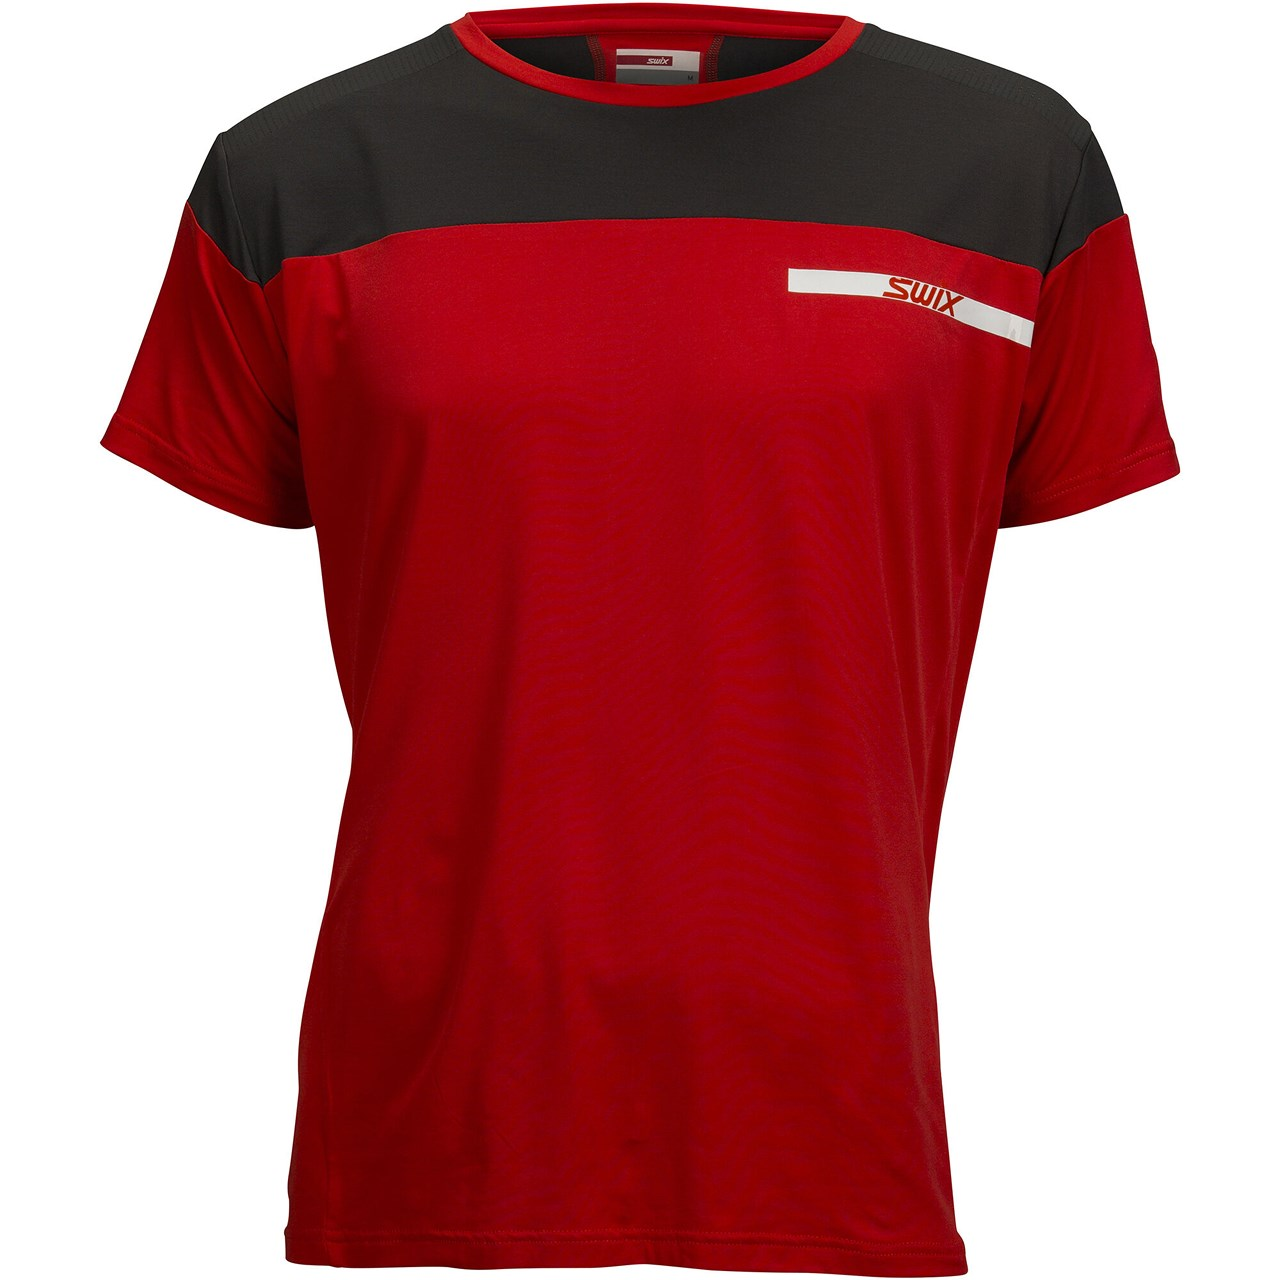 Swix Carbon t-shirt M red